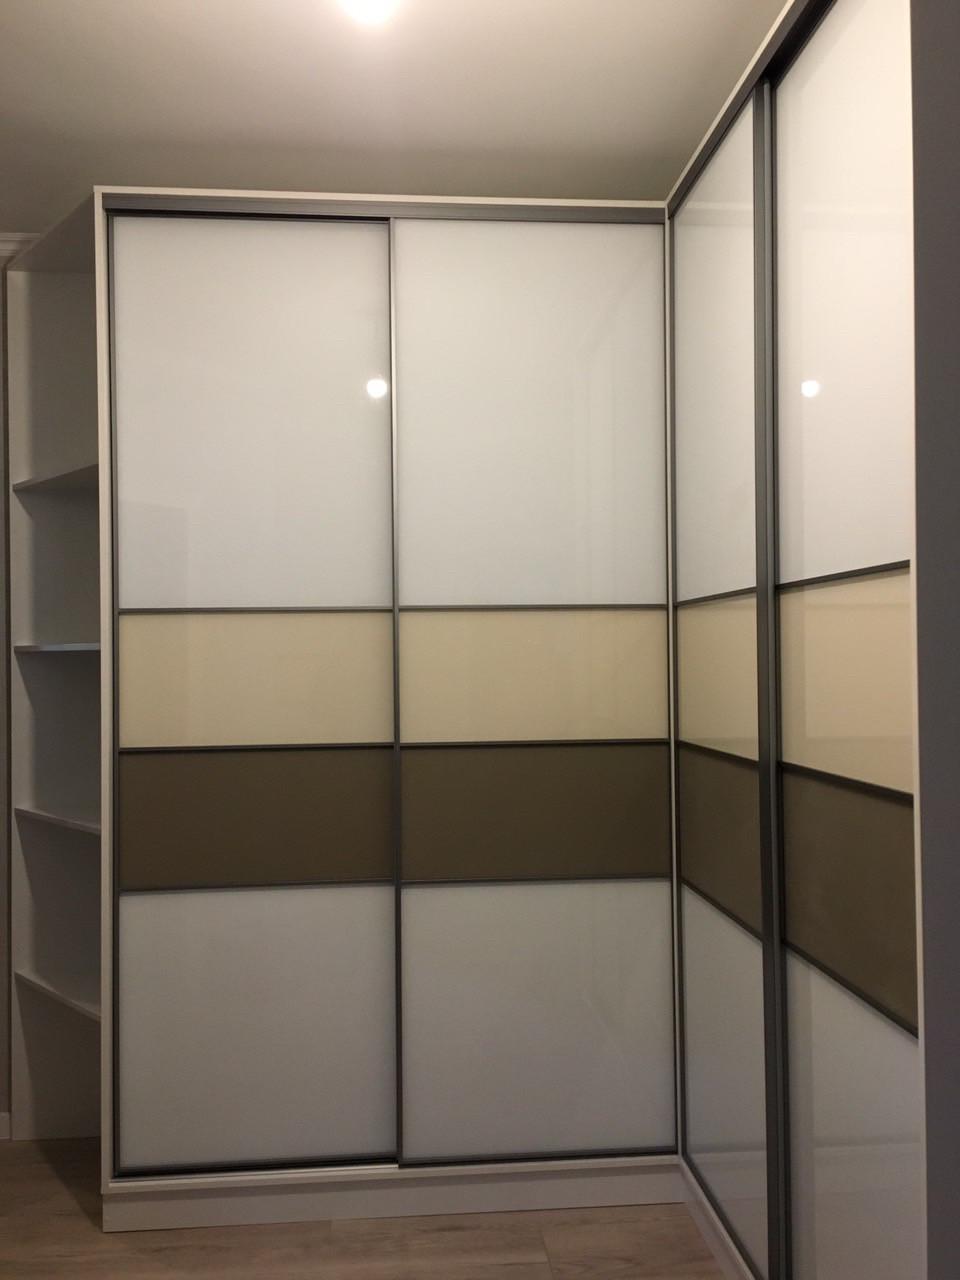 Шкаф купе угловой с стеклами на фасаде, профиль Zola. У-03002